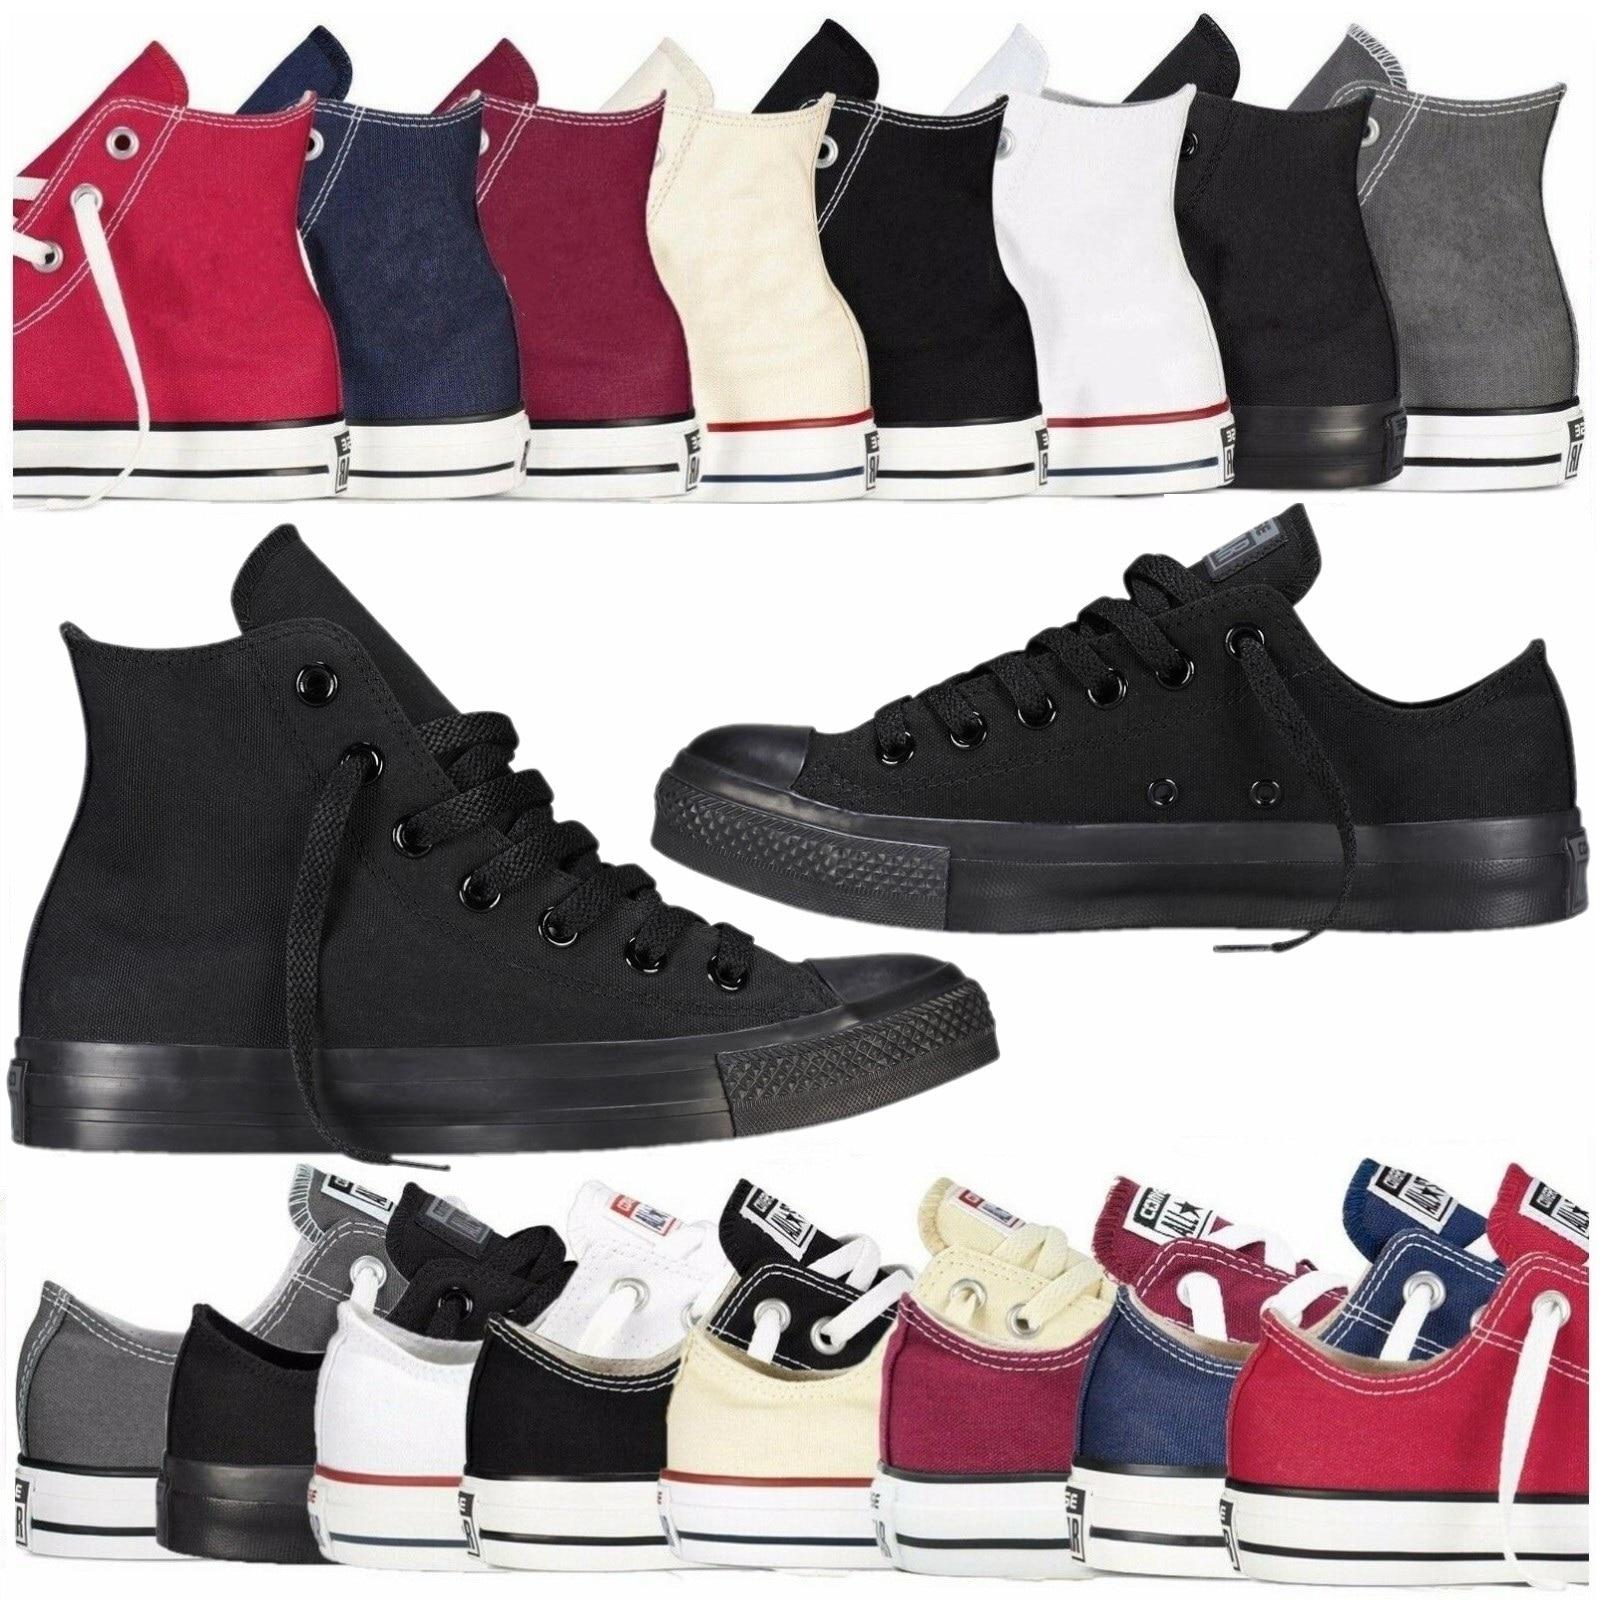 Unisex Men's & Women's Authentic Classic Allstar Designer Chuck-Taylor-Ox Low High Top Canvas Shoes Vulcanize Athletic Sneakers